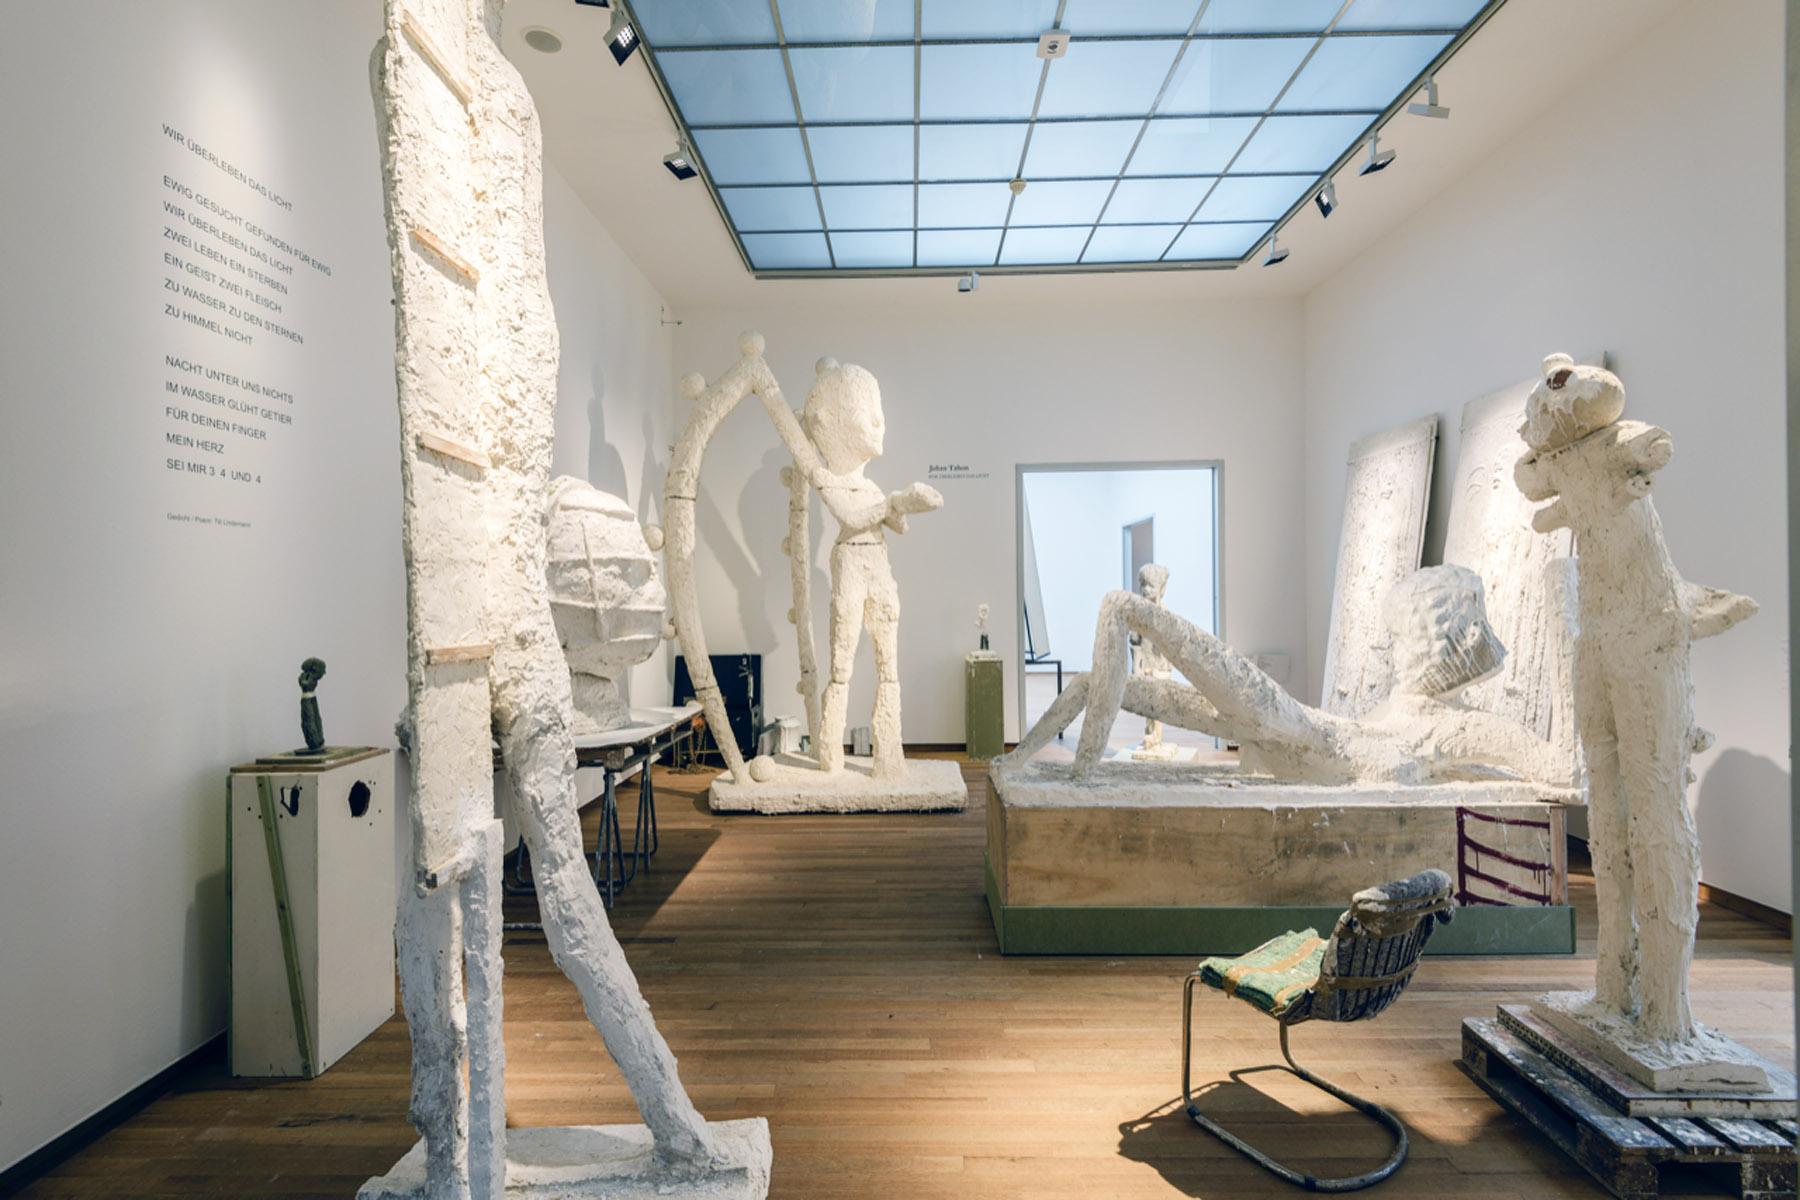 Installation View (Bonnefanten Museum, 2018)